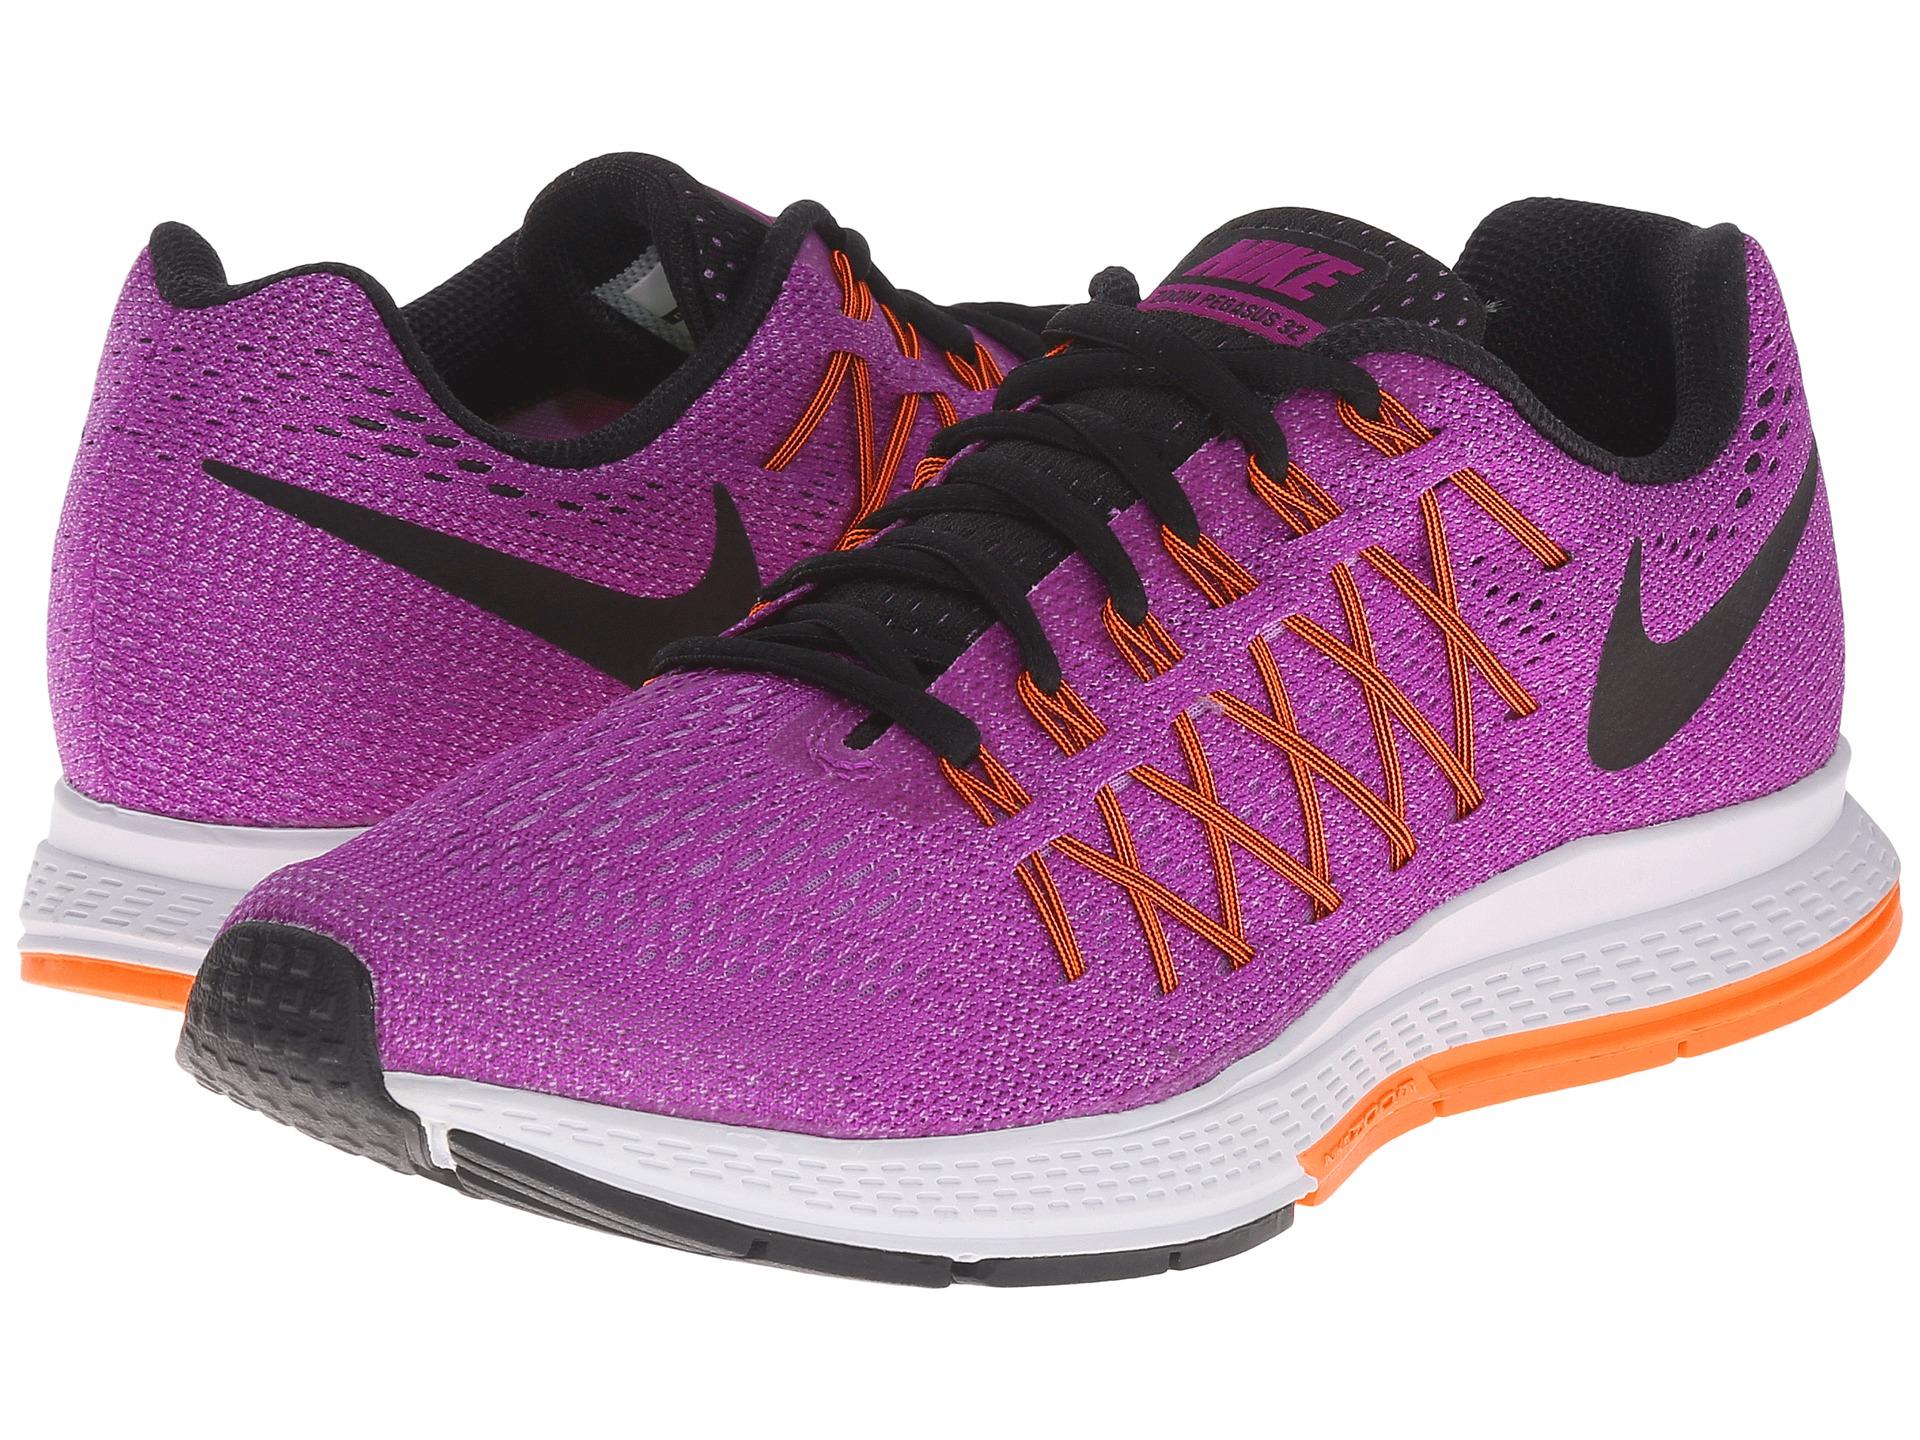 new product 7f0eb 58aae ... Lyst - Nike Air Zoom Pegasus 32 in Purple nike zoom pegasus 32 womens  black ...